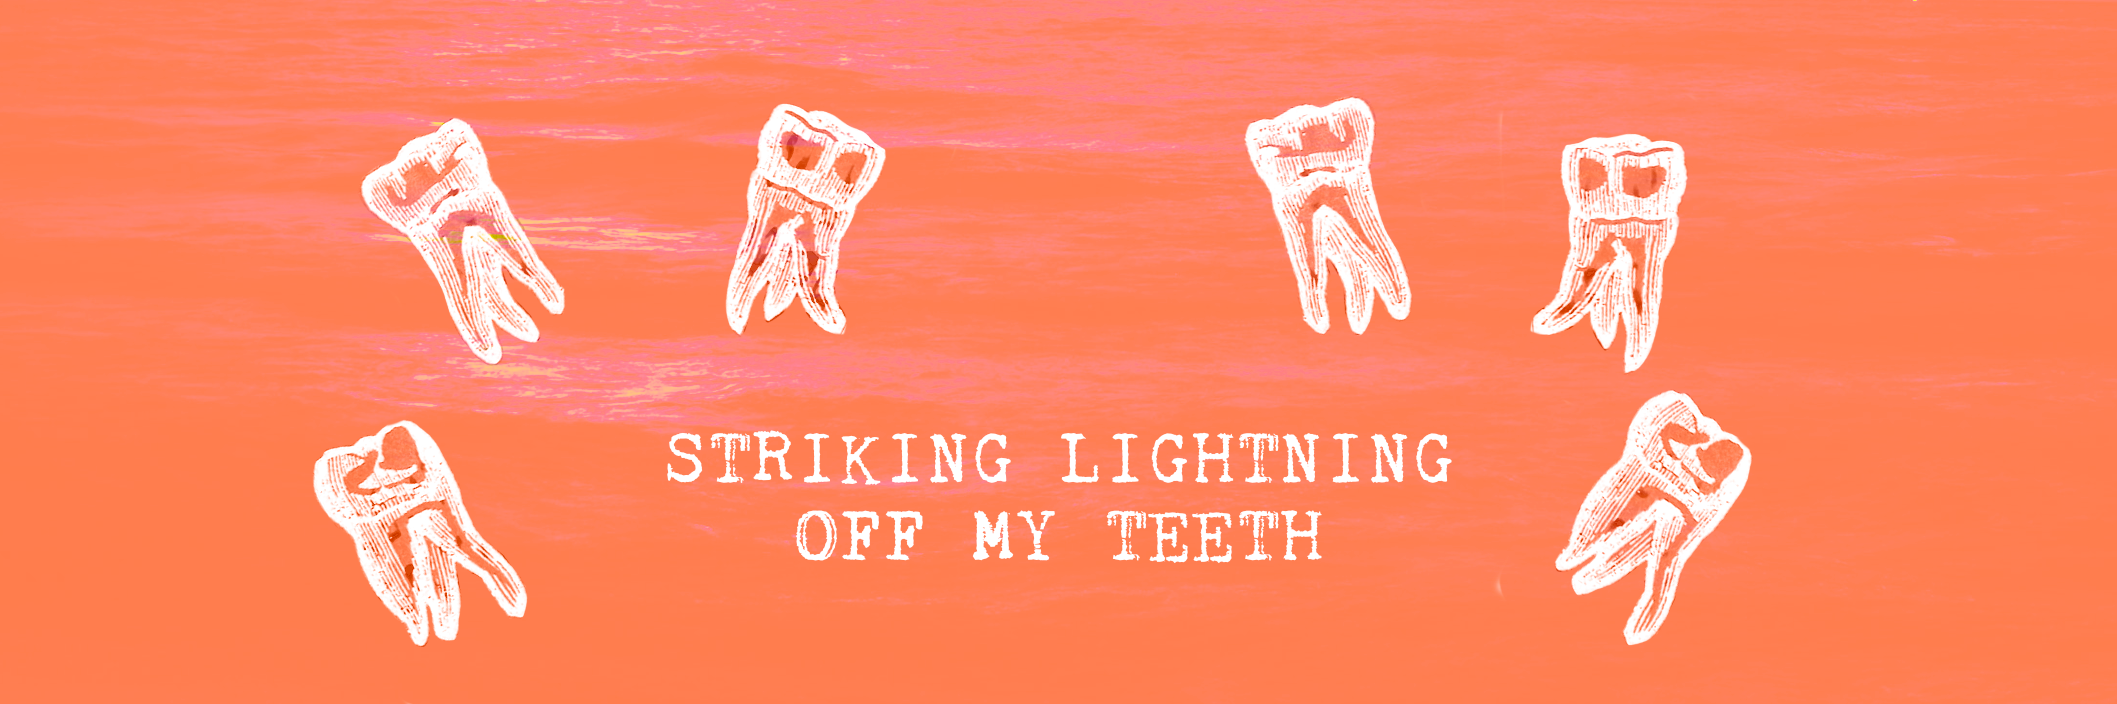 striking lightning off my teeth